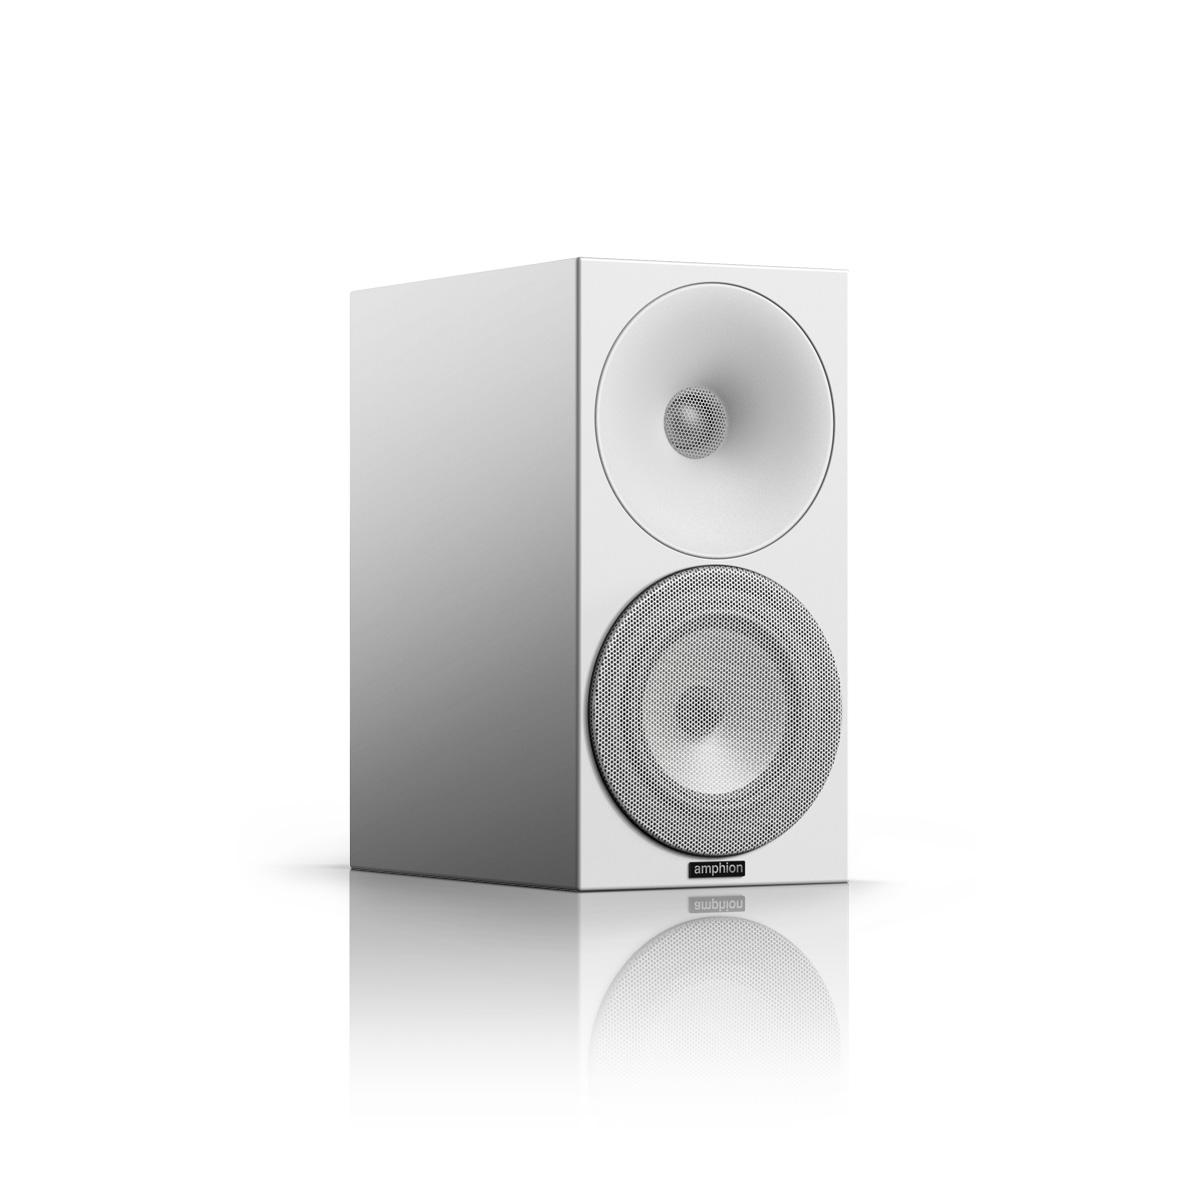 Amphion Loudspeakers Amphion Argon1 Full White